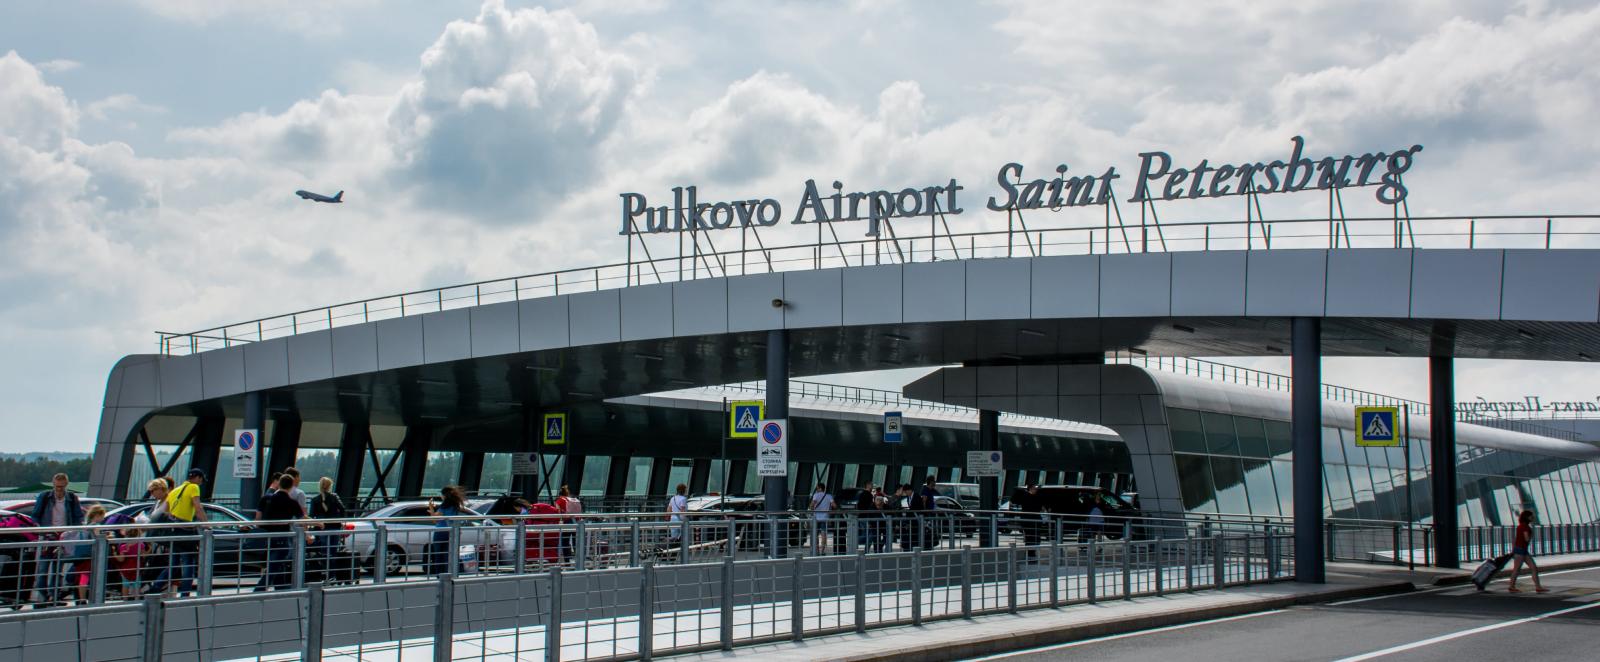 Resultado de imagen para pulkovo airport